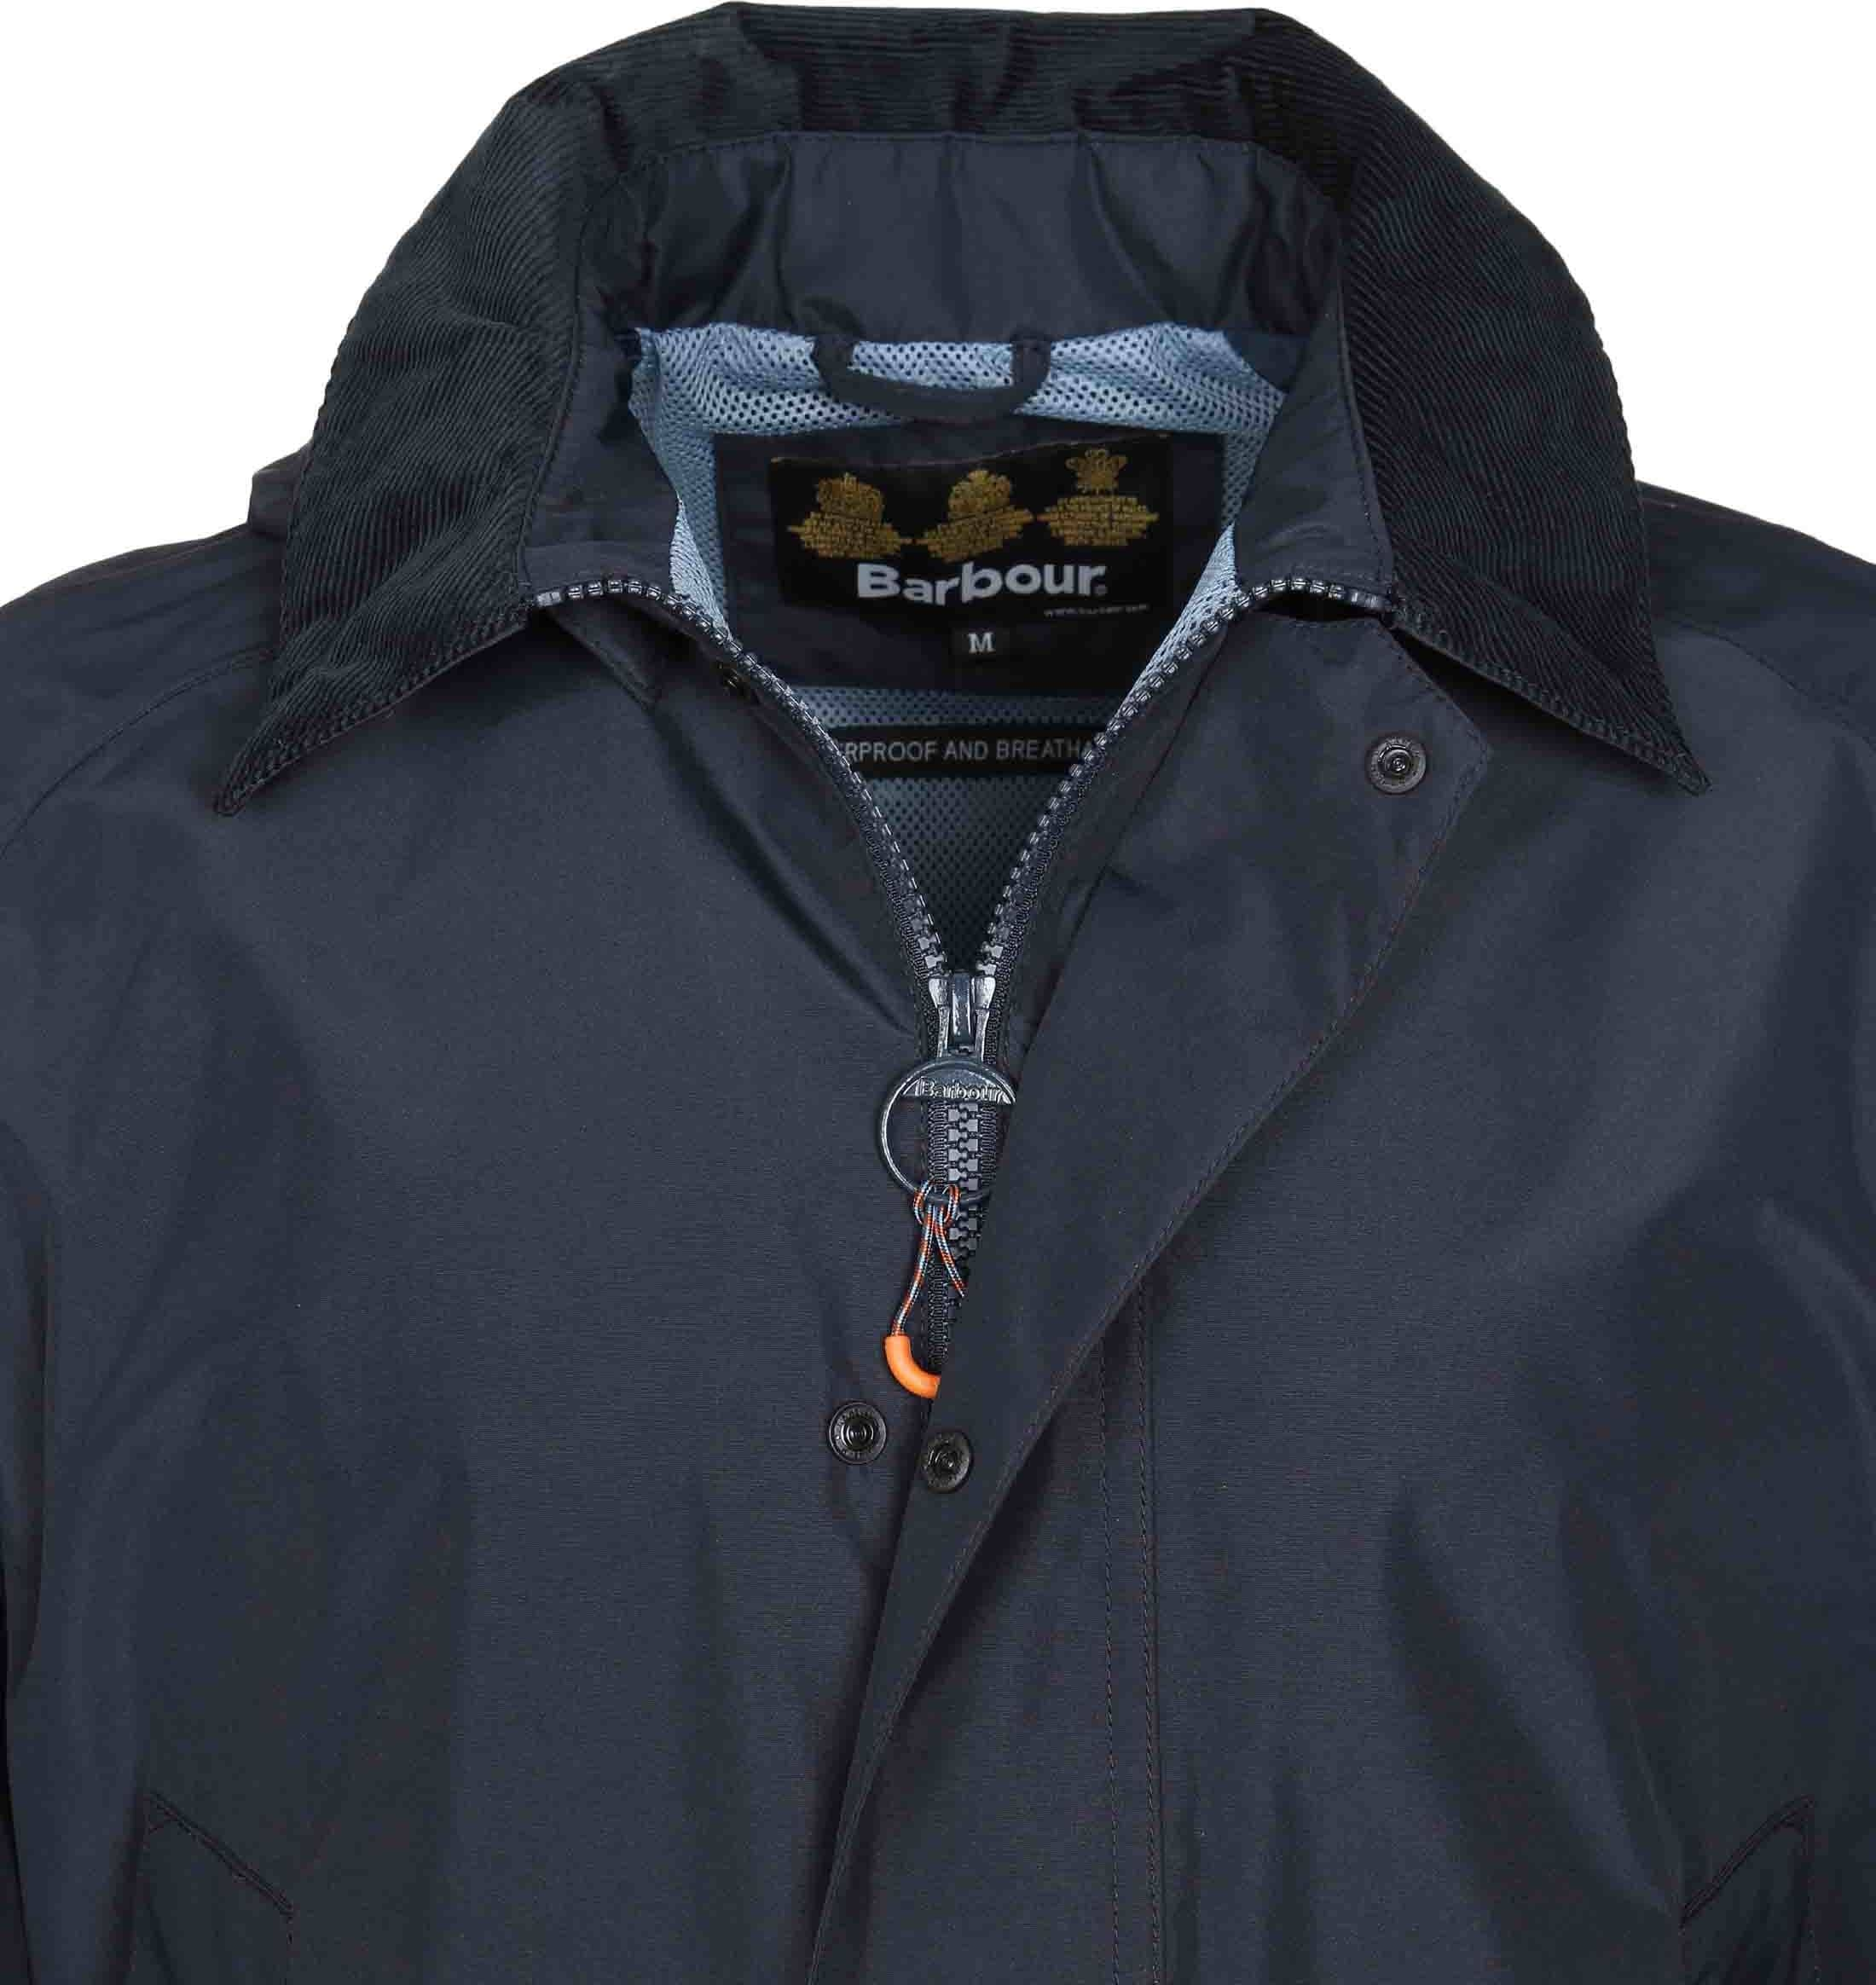 Barbour Bann Jacket Navy MWB0608NY71 order online  cb998b614d